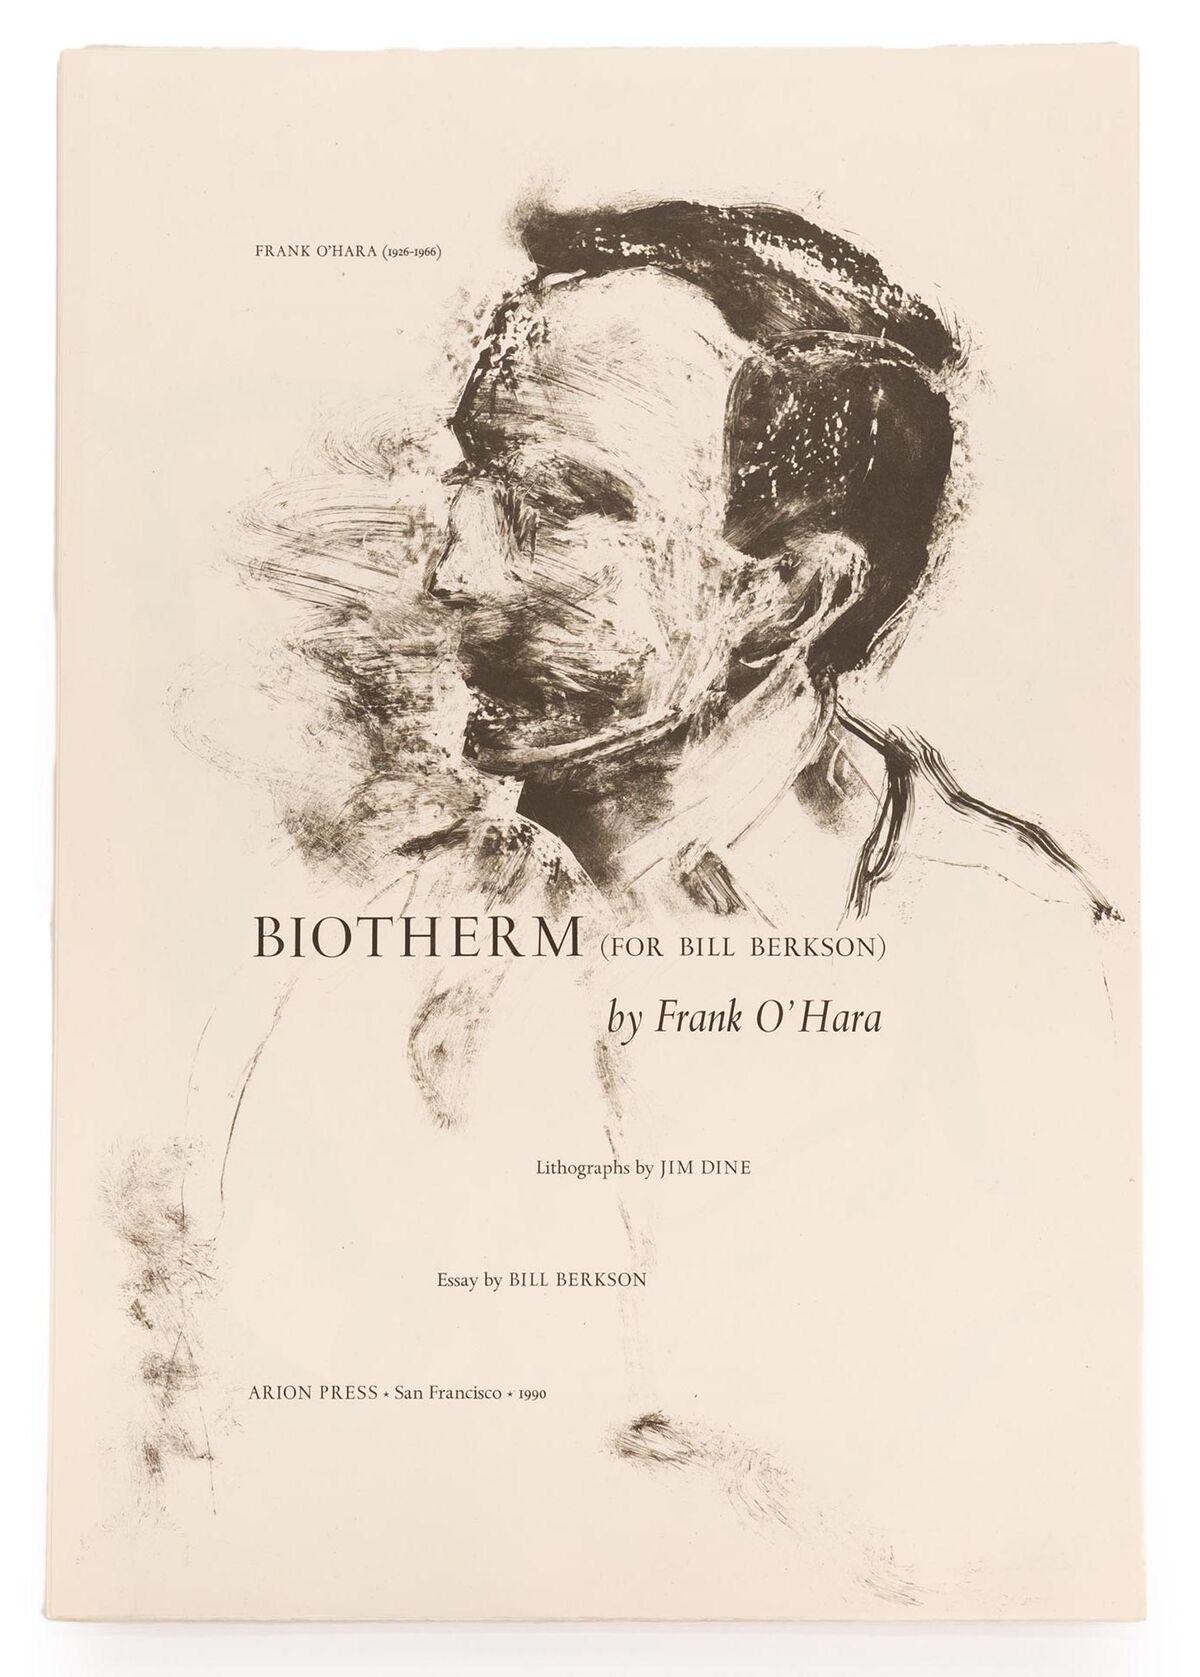 Jim Dine, Biotherm by Frank O'Hara, 1990.